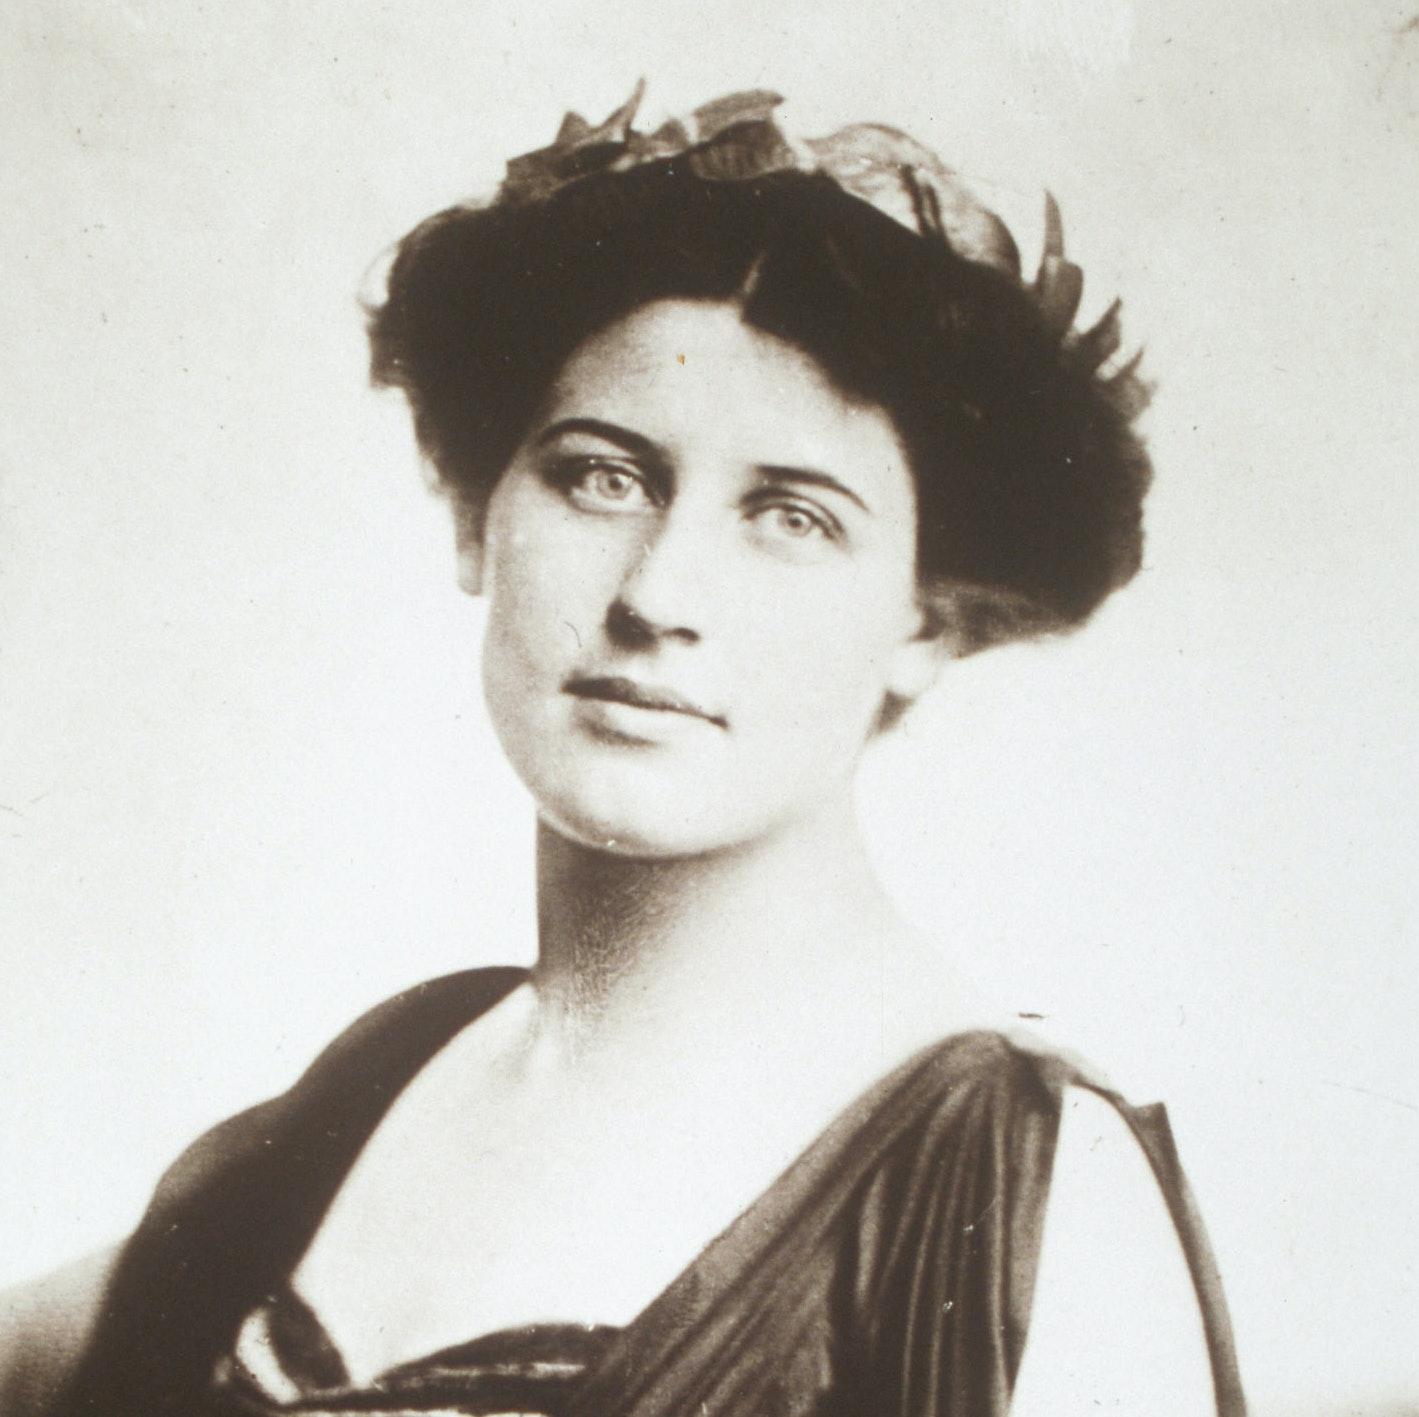 Portrait of Inez Milholland